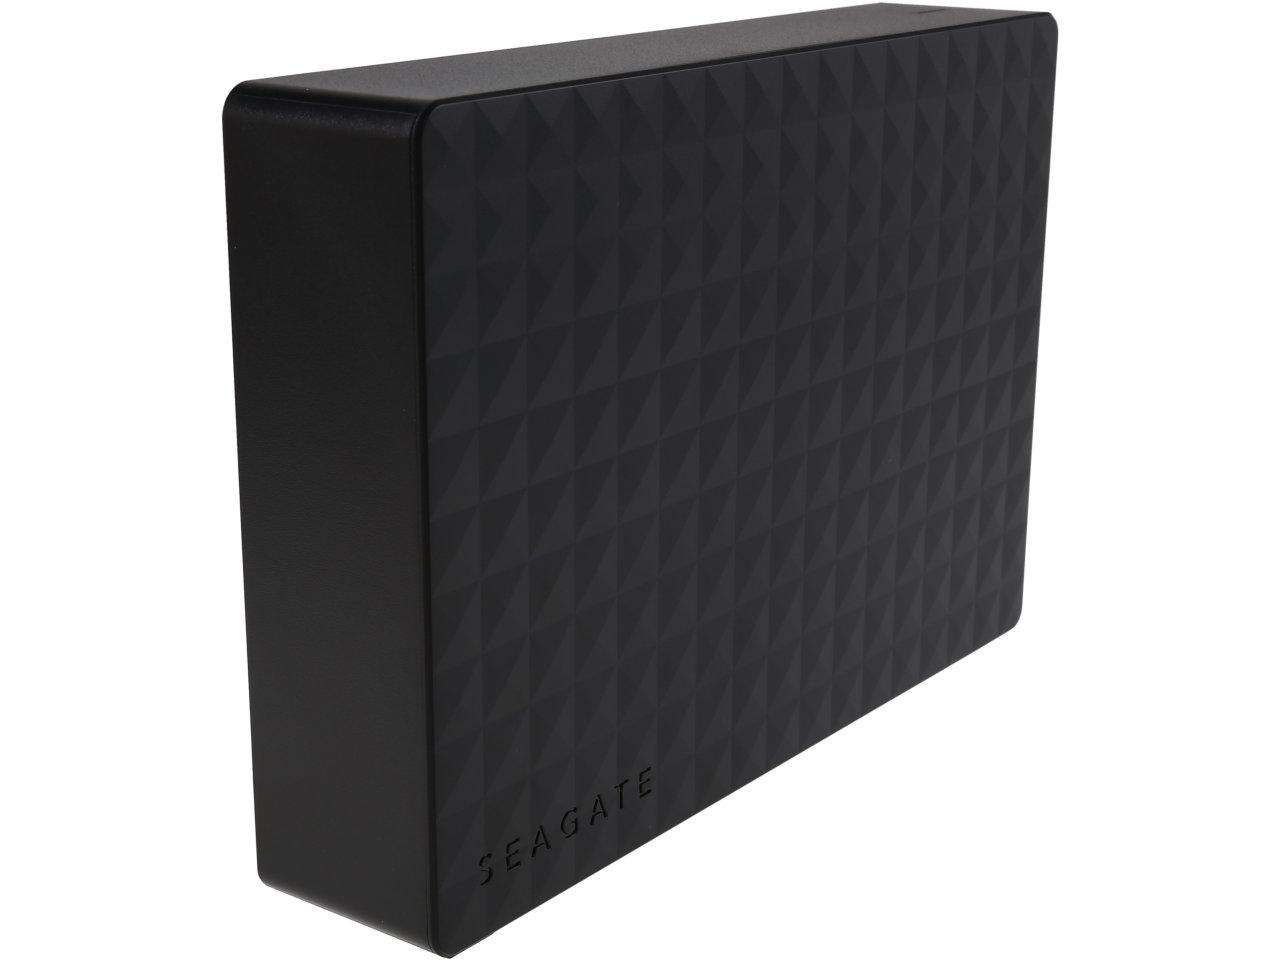 "4 TB Seagate Expansion 3.5"" USB 3.0 Desktop External Hard Drive for $99.99 AC, Refurb. 160 GB Intel 320 Series 2.5"" SATA II MLC Internal SSD for $34.49 & More @ Newegg.com"